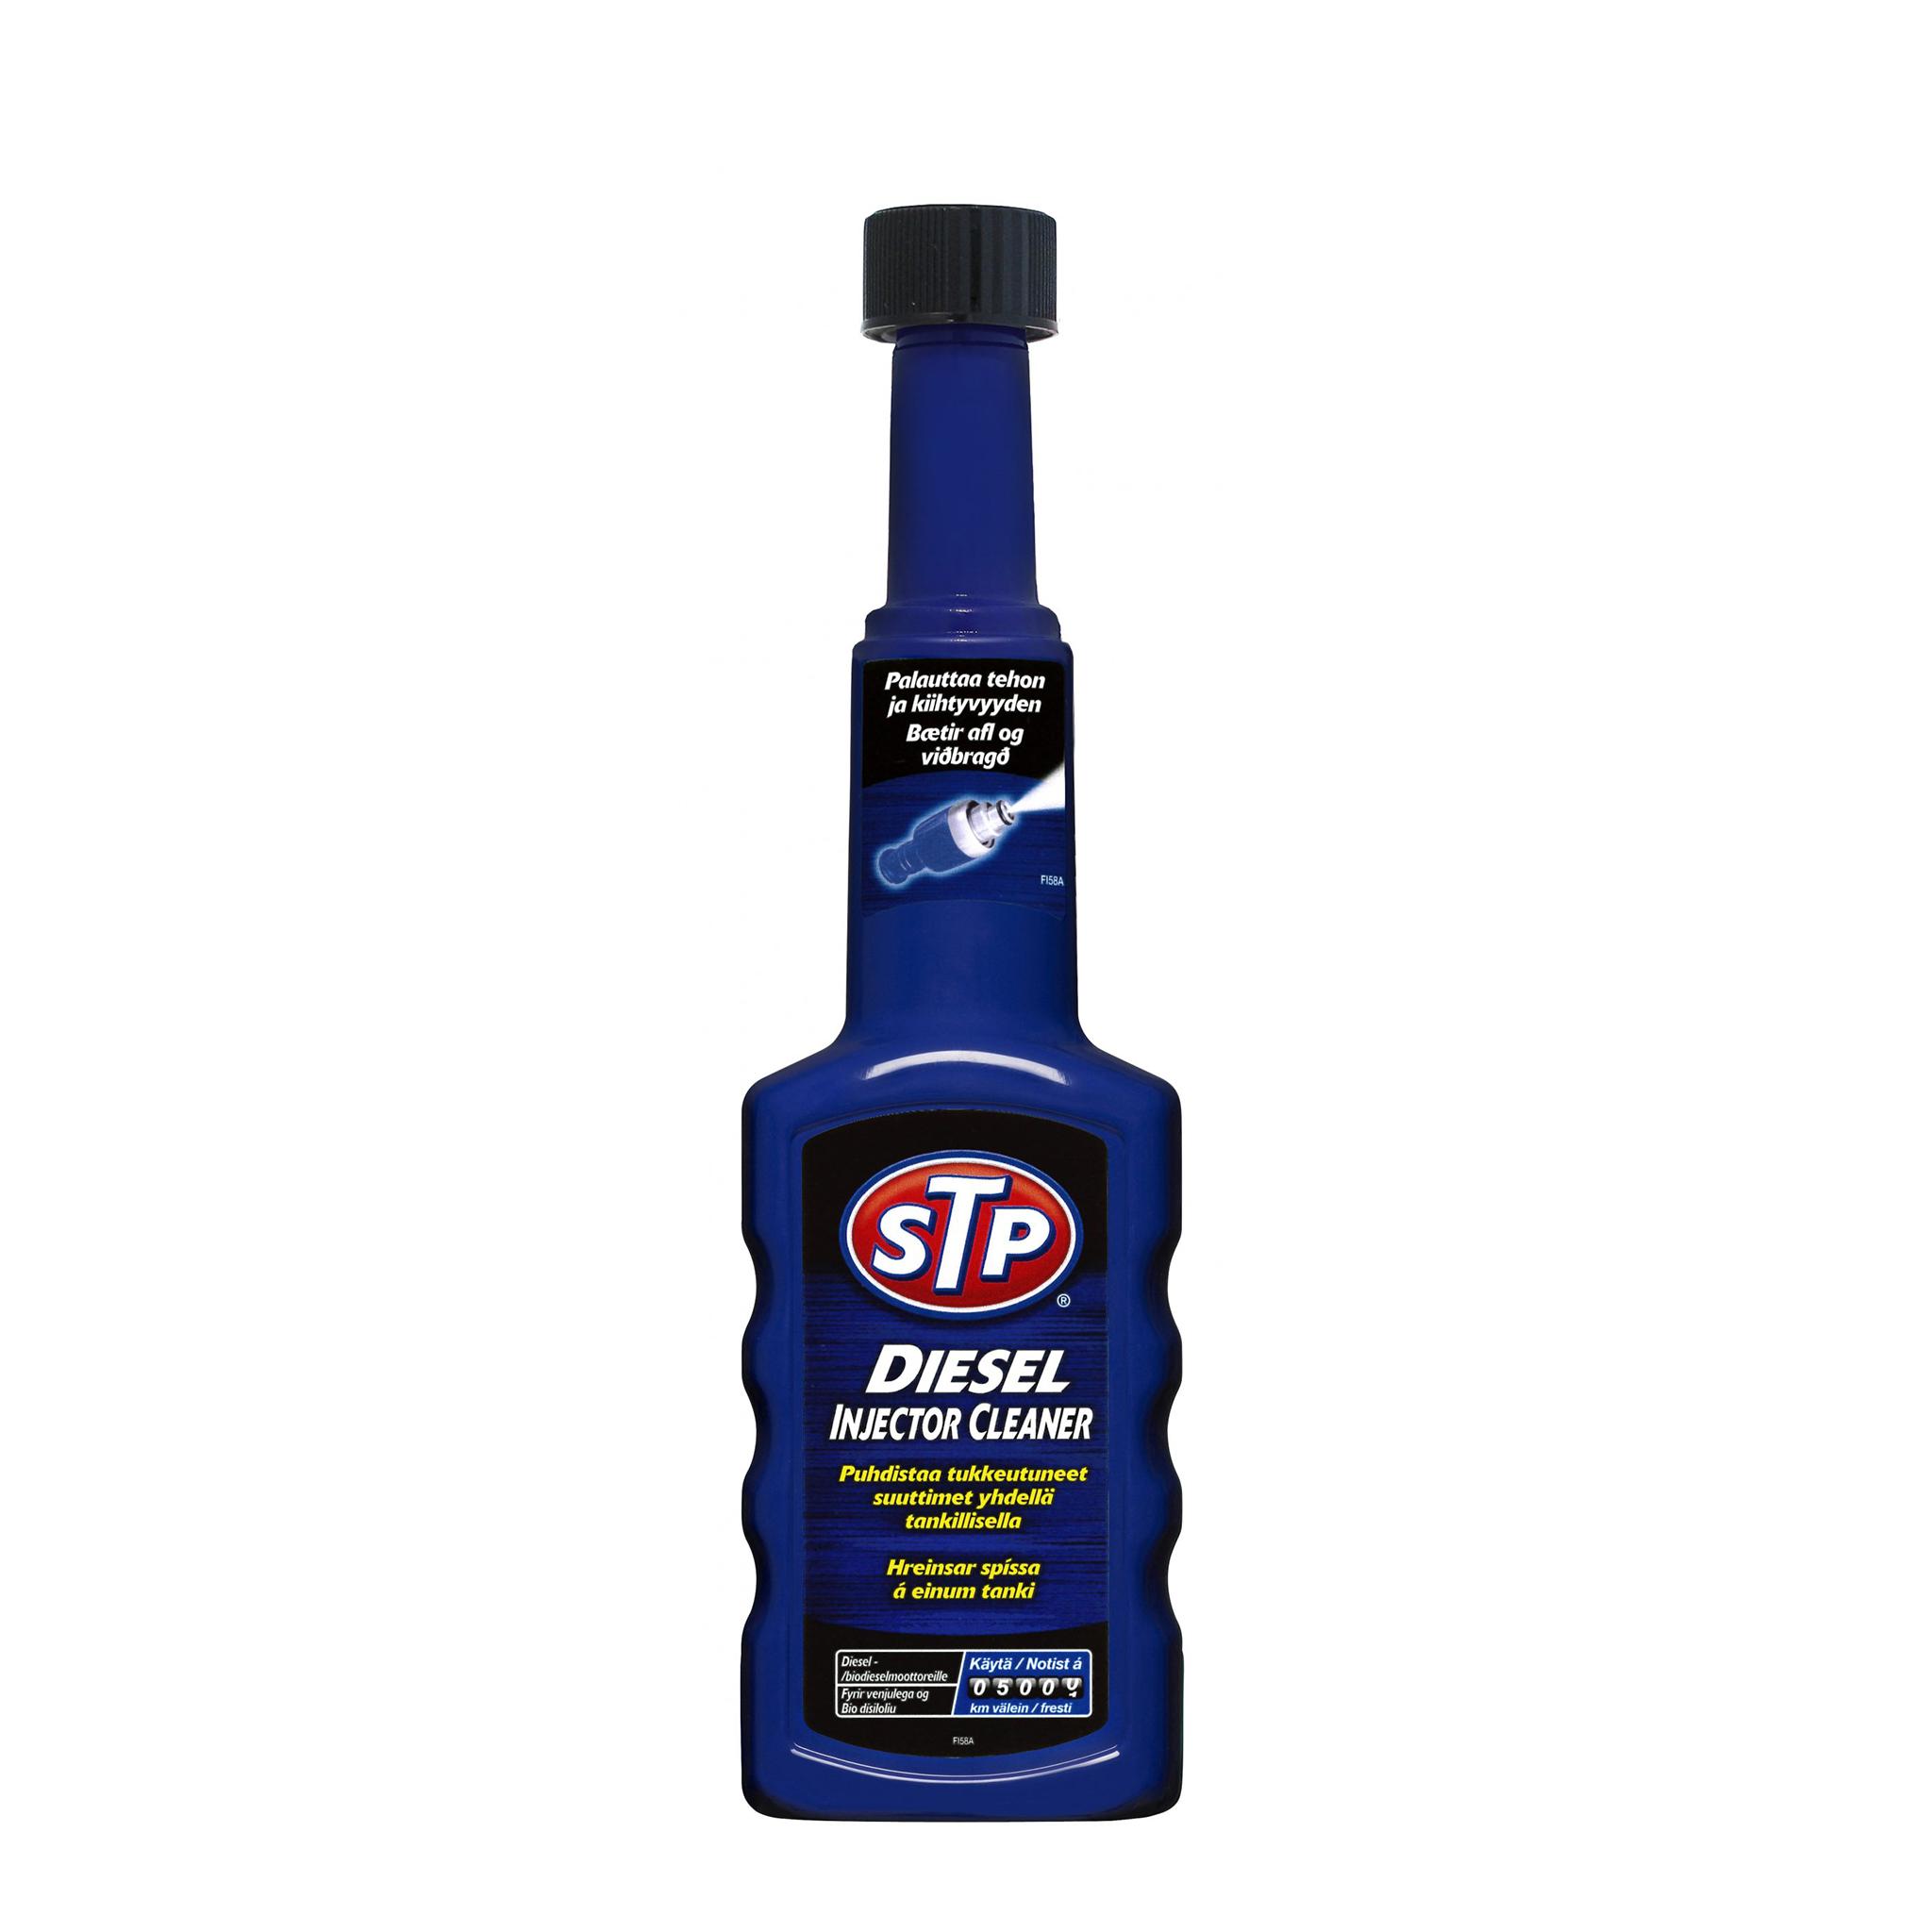 Bränsletillsats, STP Diesel Injector Cleaner, 200 ml